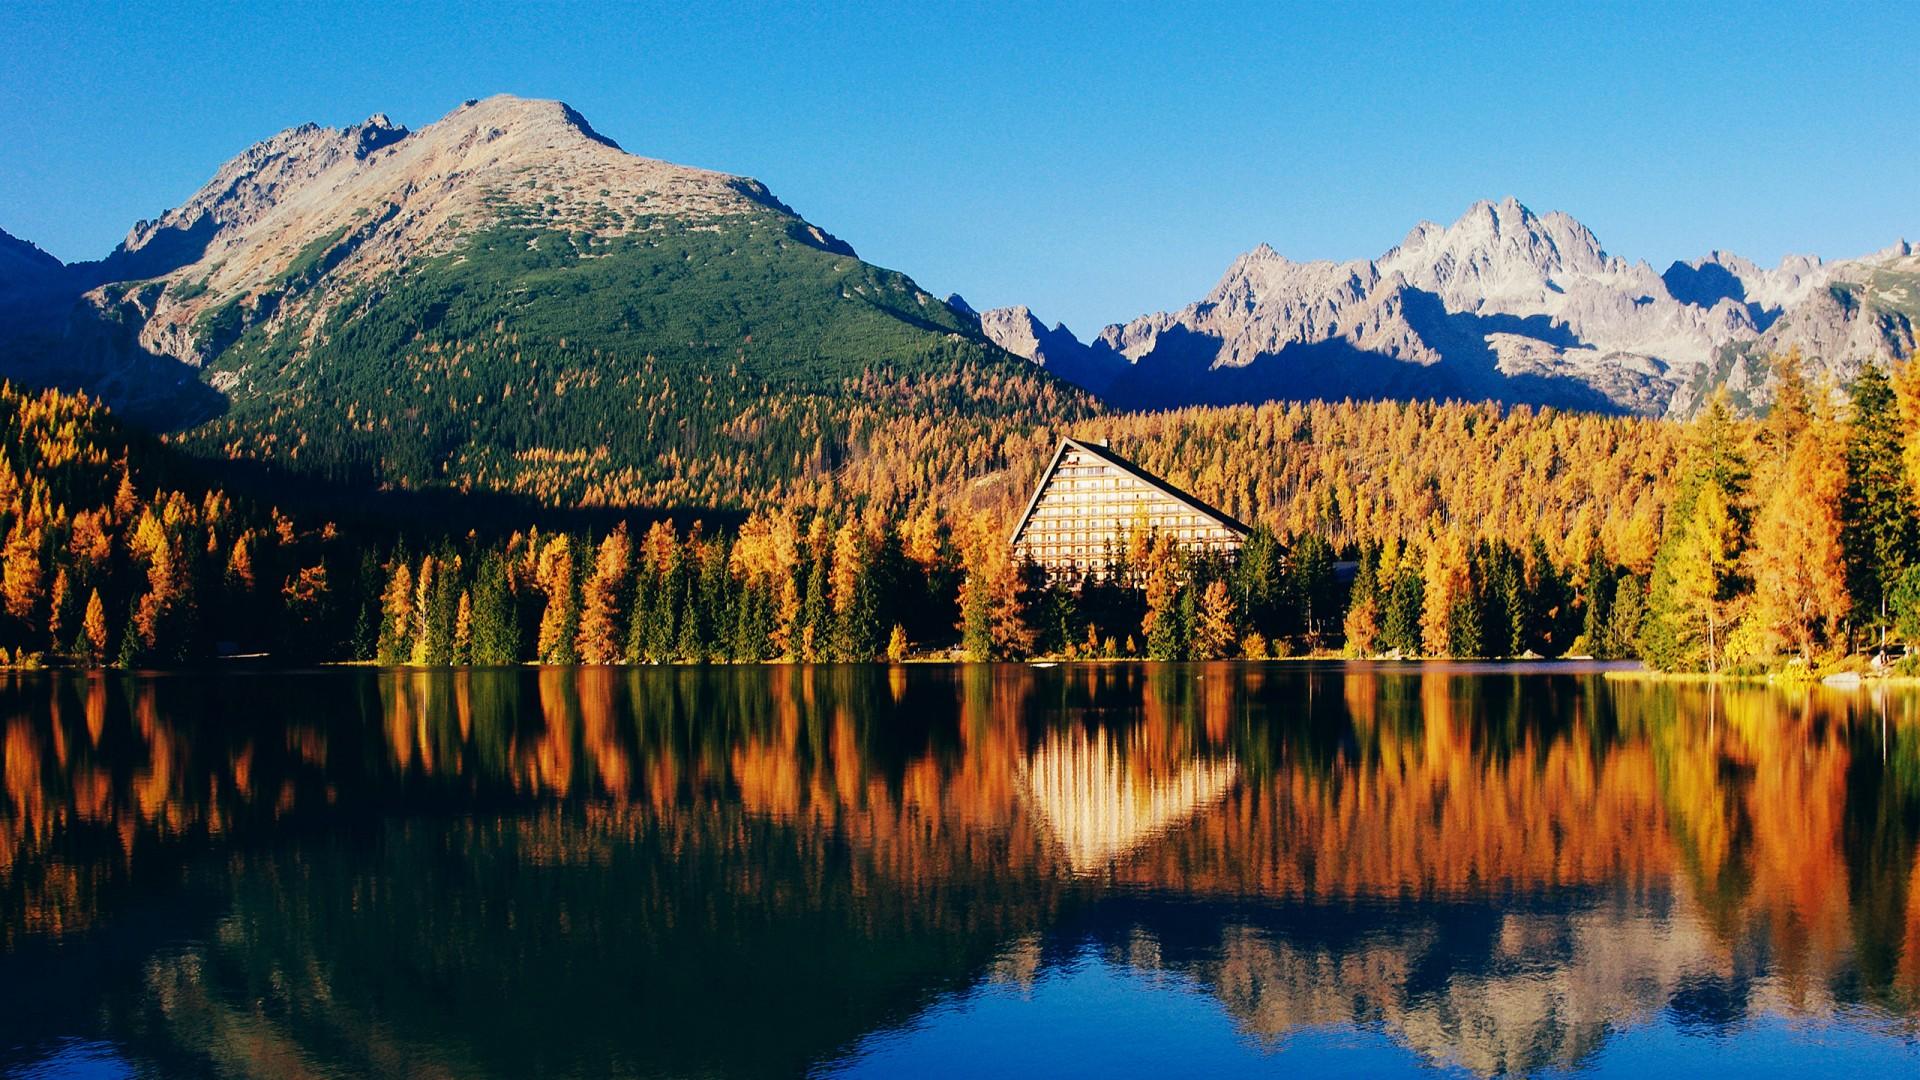 Iphone Hd Retina Wallpapers Beautiful Lake Scenery Wallpapers Hd Wallpapers Id 19405